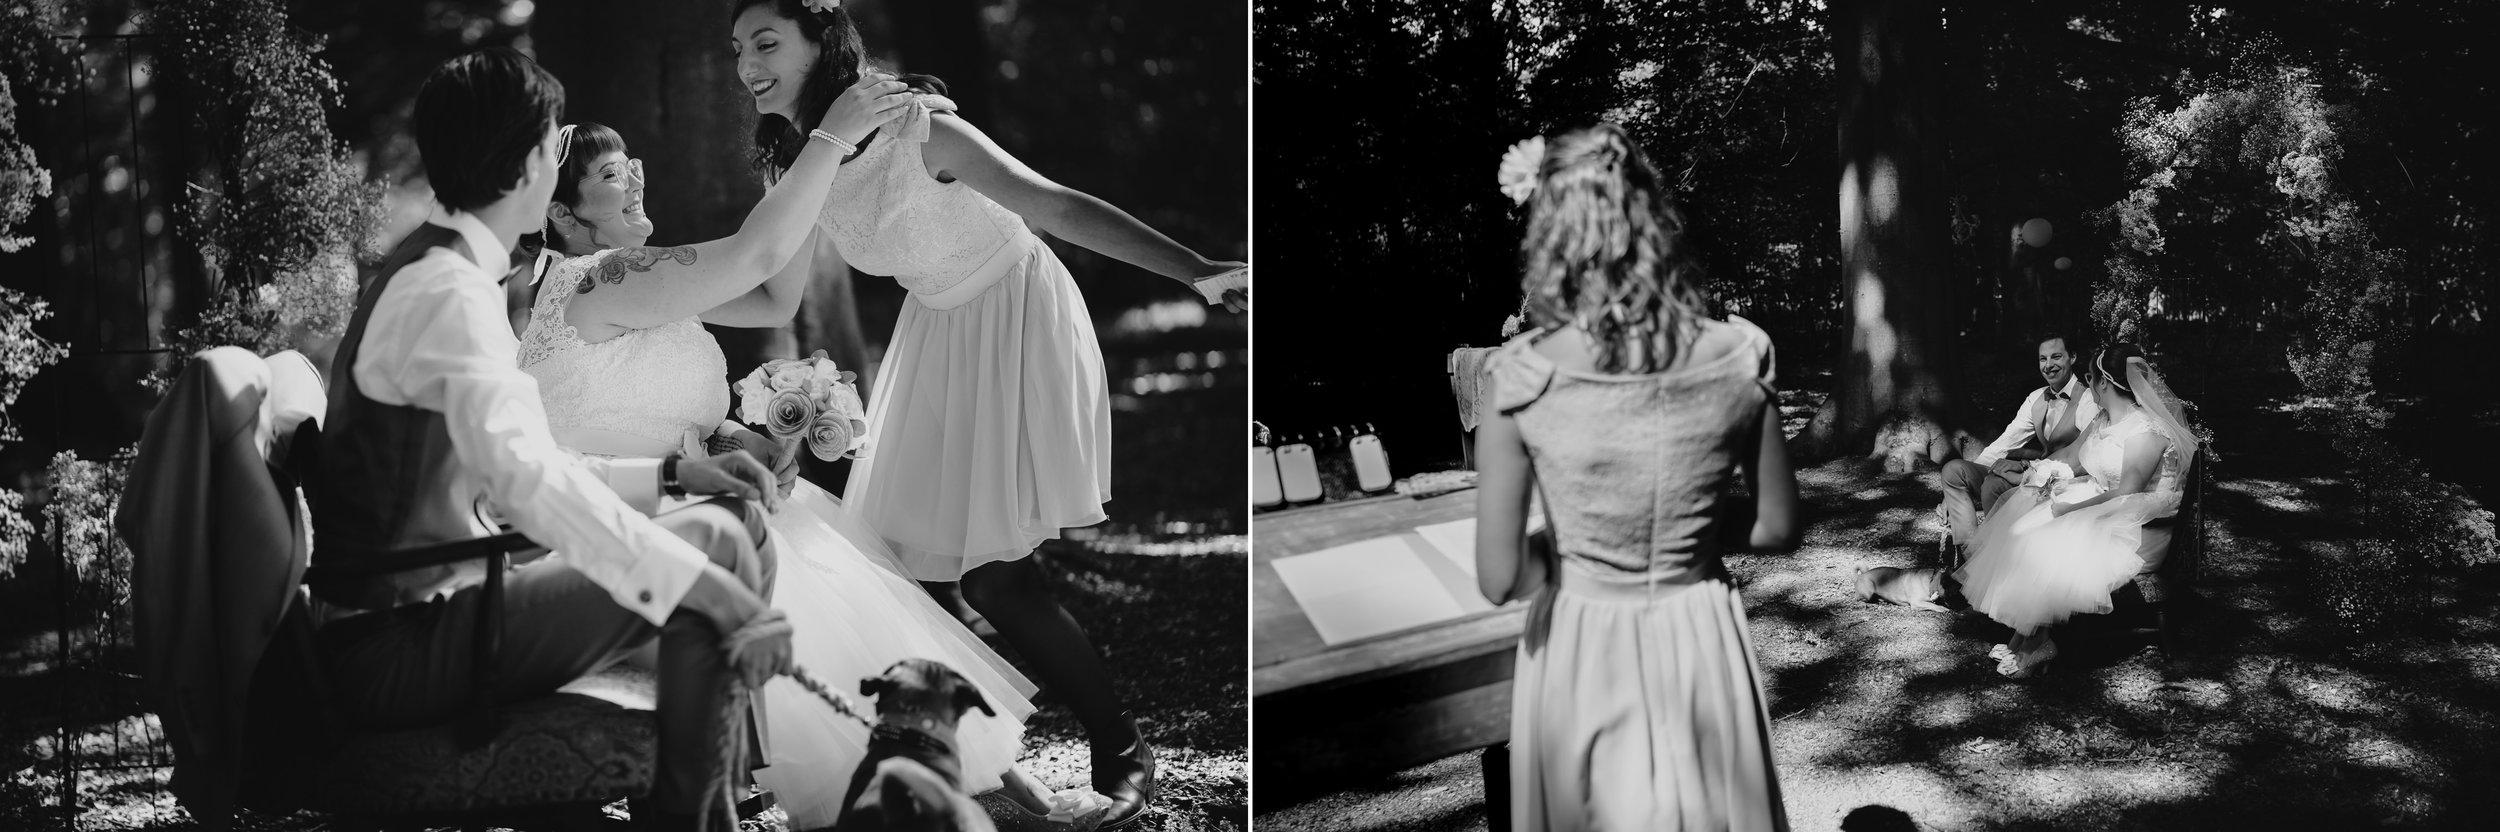 amsterdam-wedding-photographer-bruidsfotografie-trouwfotograaf-mark-hadden-Lucie-Luuk-094-2 copy.jpg